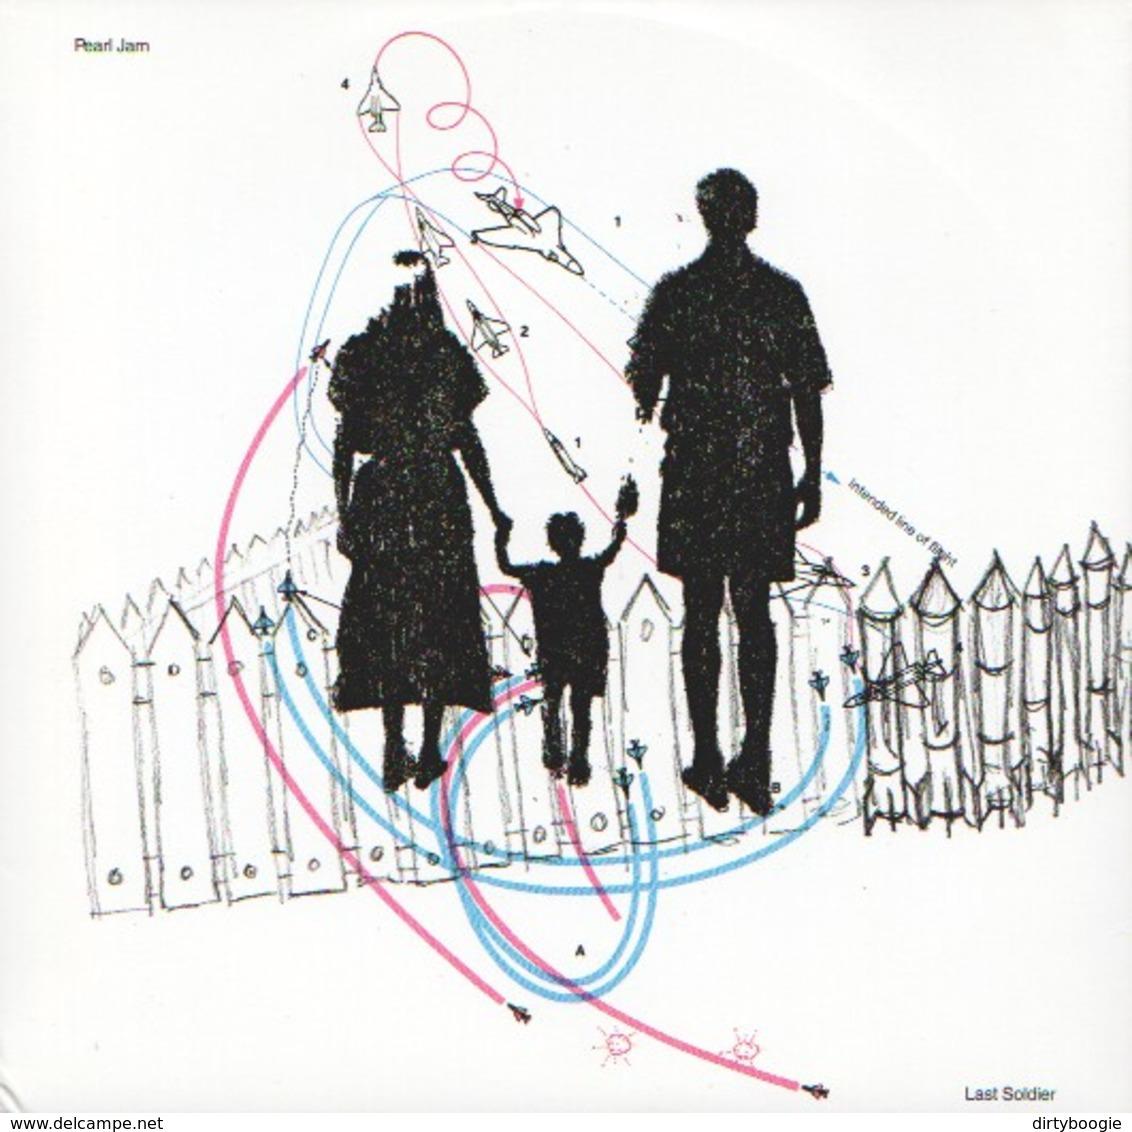 PEARL JAM - Christmas 10 - 2 X 45t - John LENNON - RAMONES - Rock